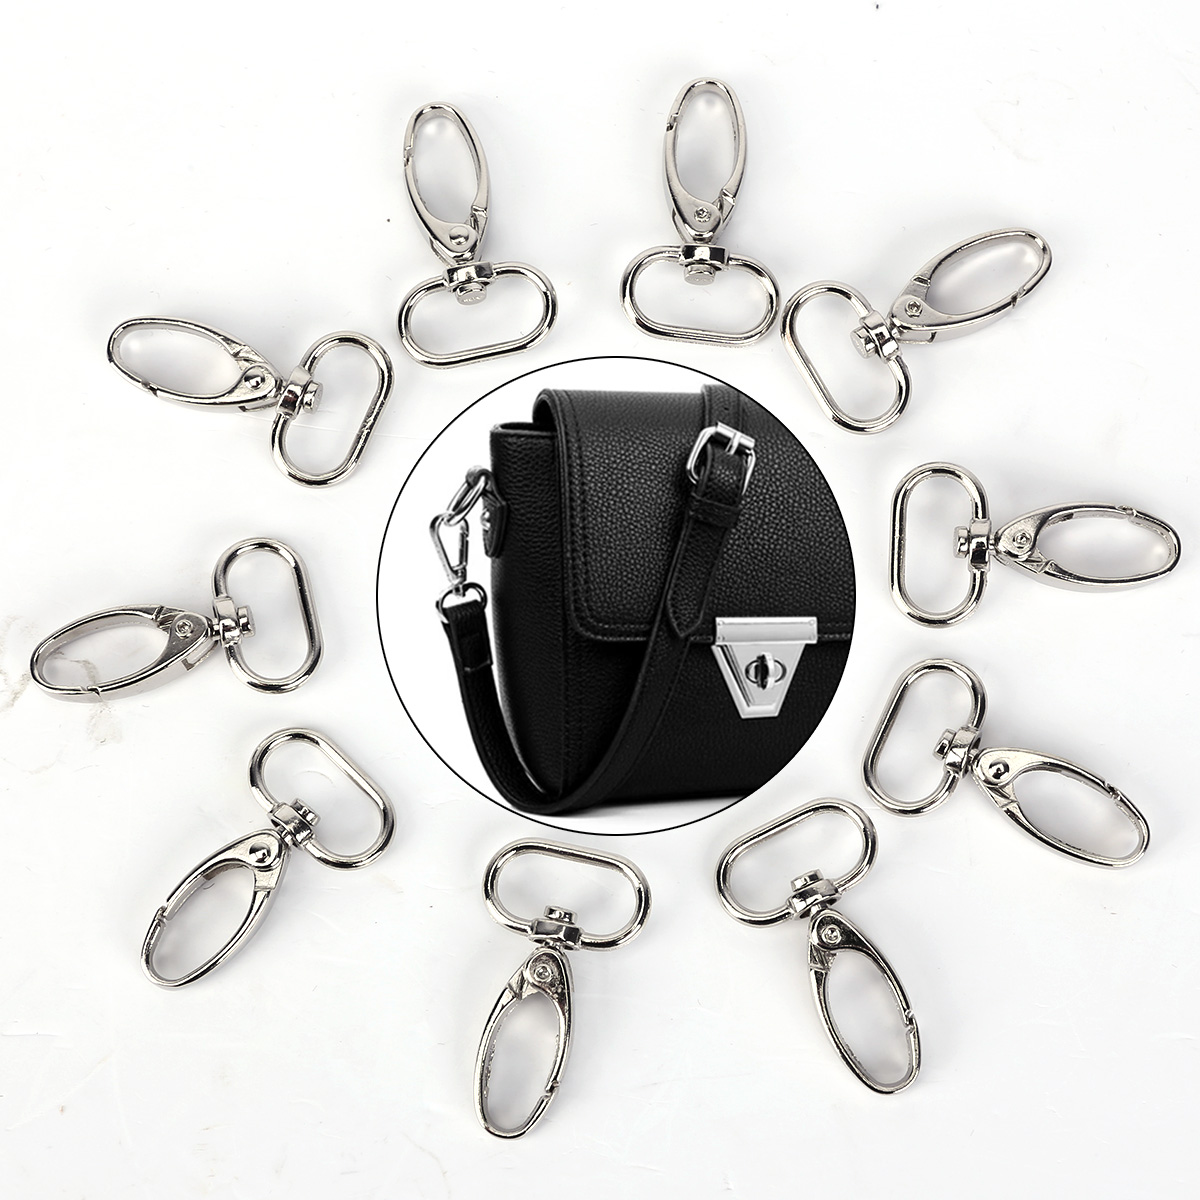 10Pcs Alloy Swivel Lobster Claw Clasps Swivel Snap Hooks for bag//purse//handmade